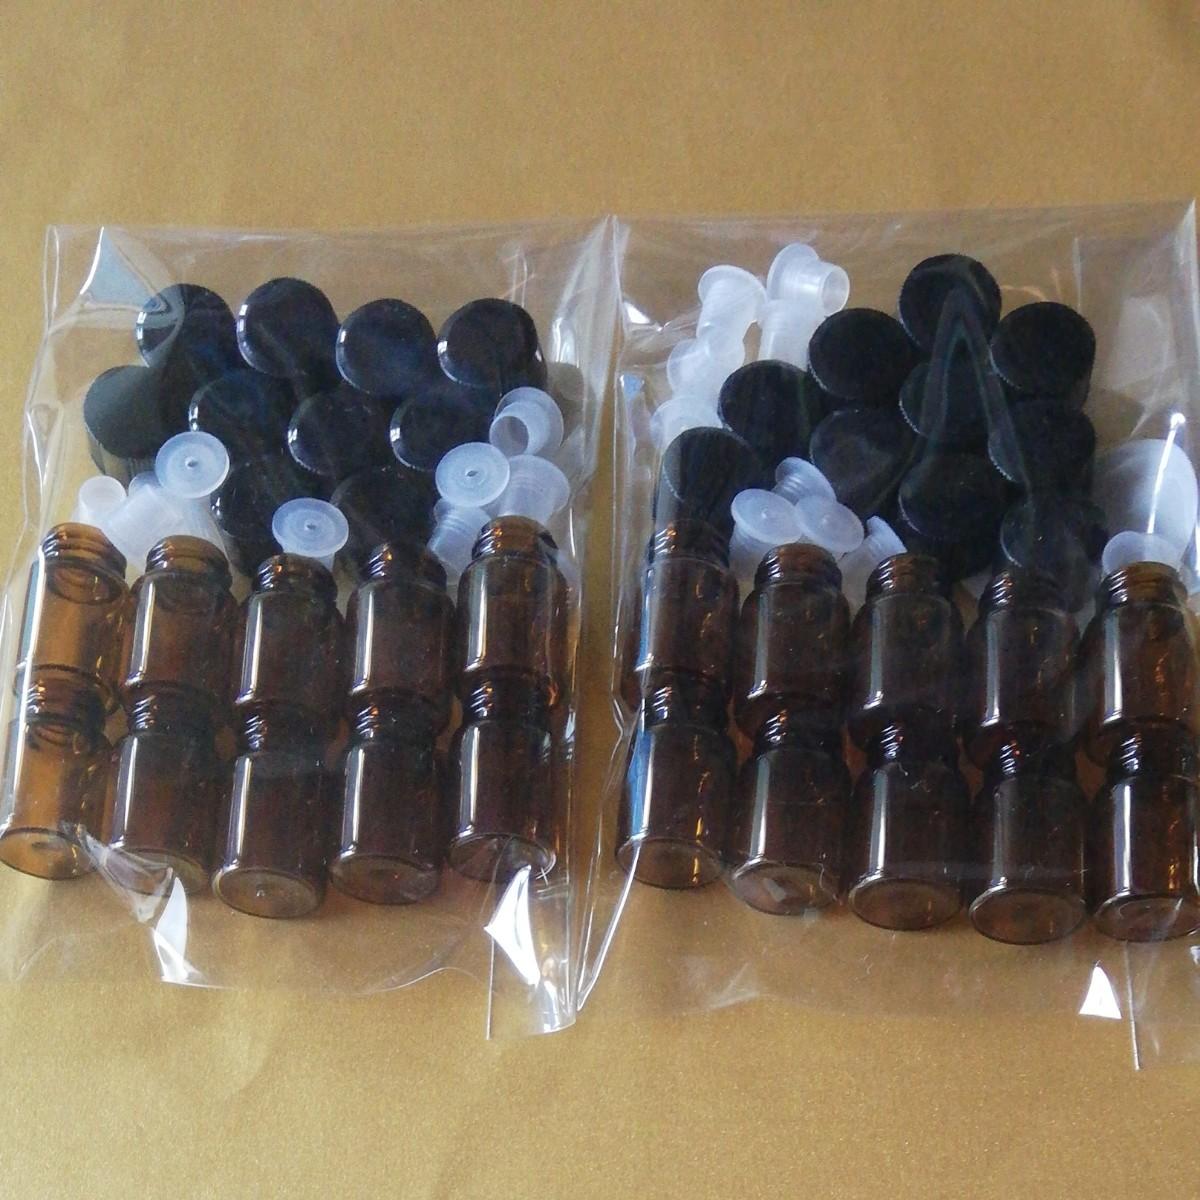 doTERRA ドテラ エッセンシャルオイル用 ミニボトル 容量2ml 未使用空き瓶 20個セット